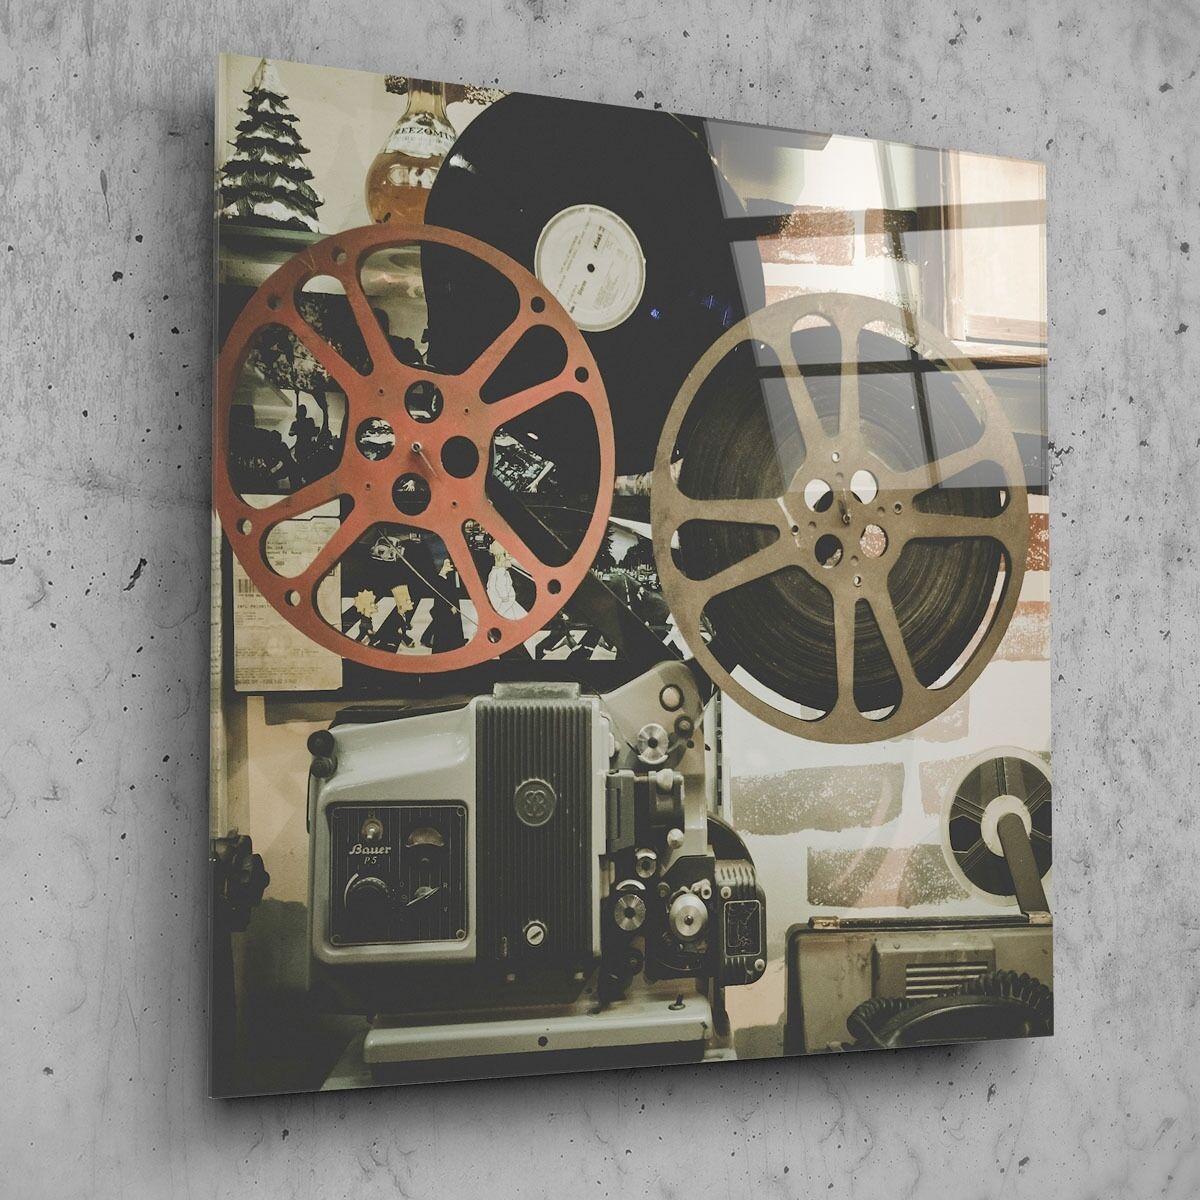 70x70cm Wall Art Glass Print Picture Film Movie Vintage Projector p27008 FREE DE